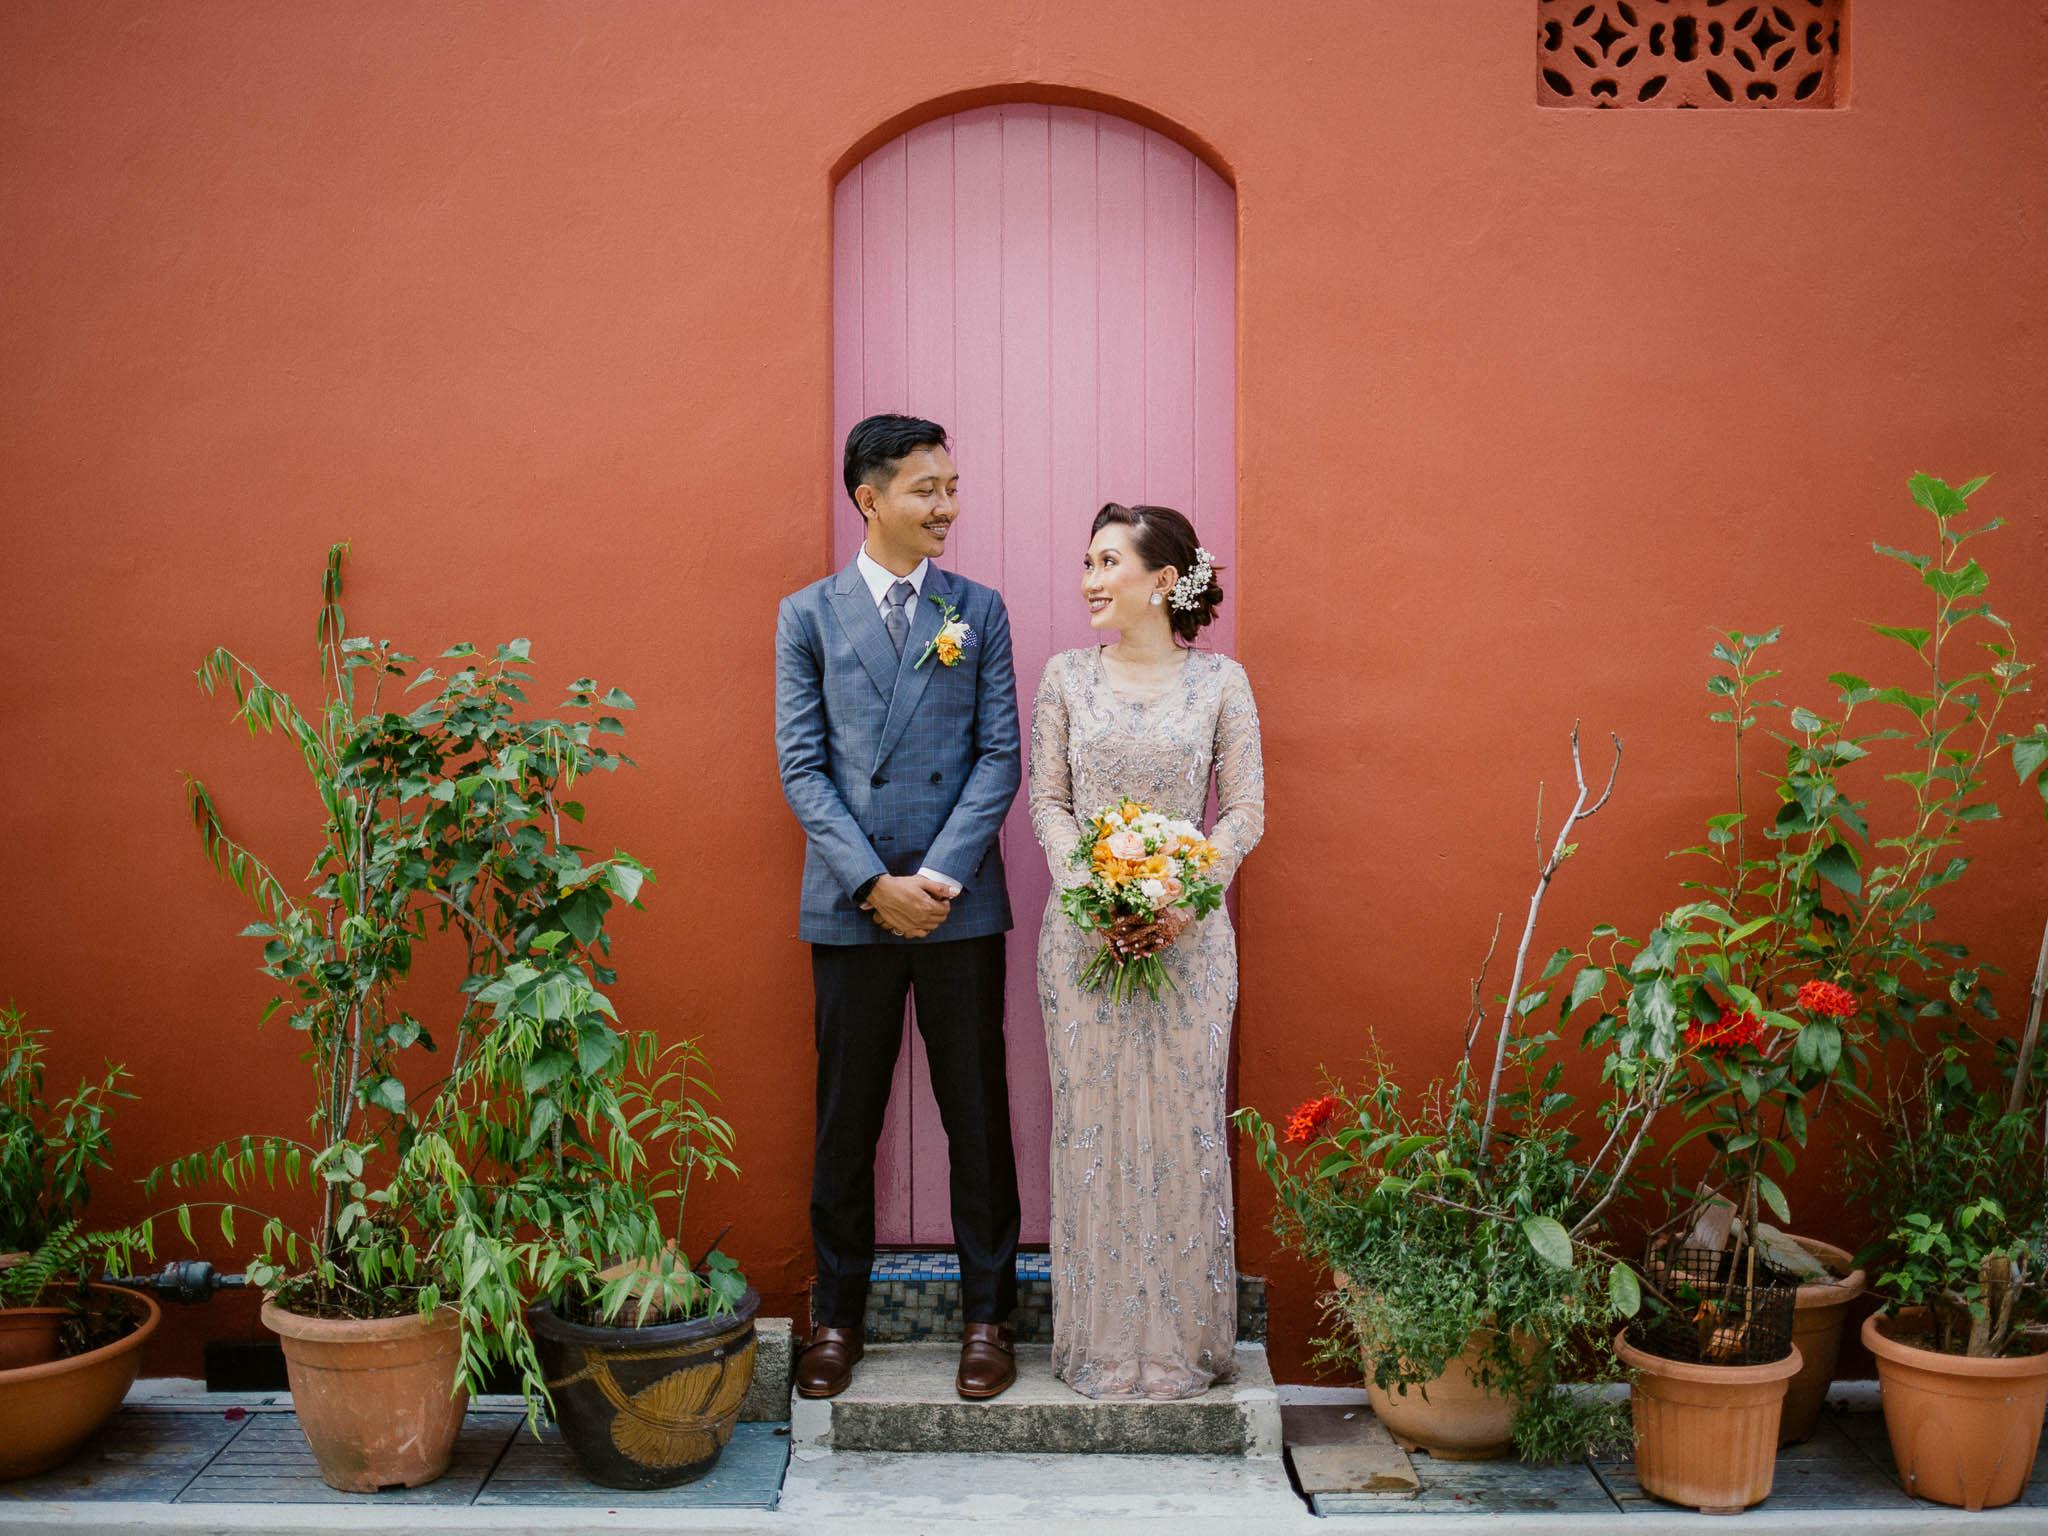 singapore-wedding-photographer-addafiq-nufail-088.jpg